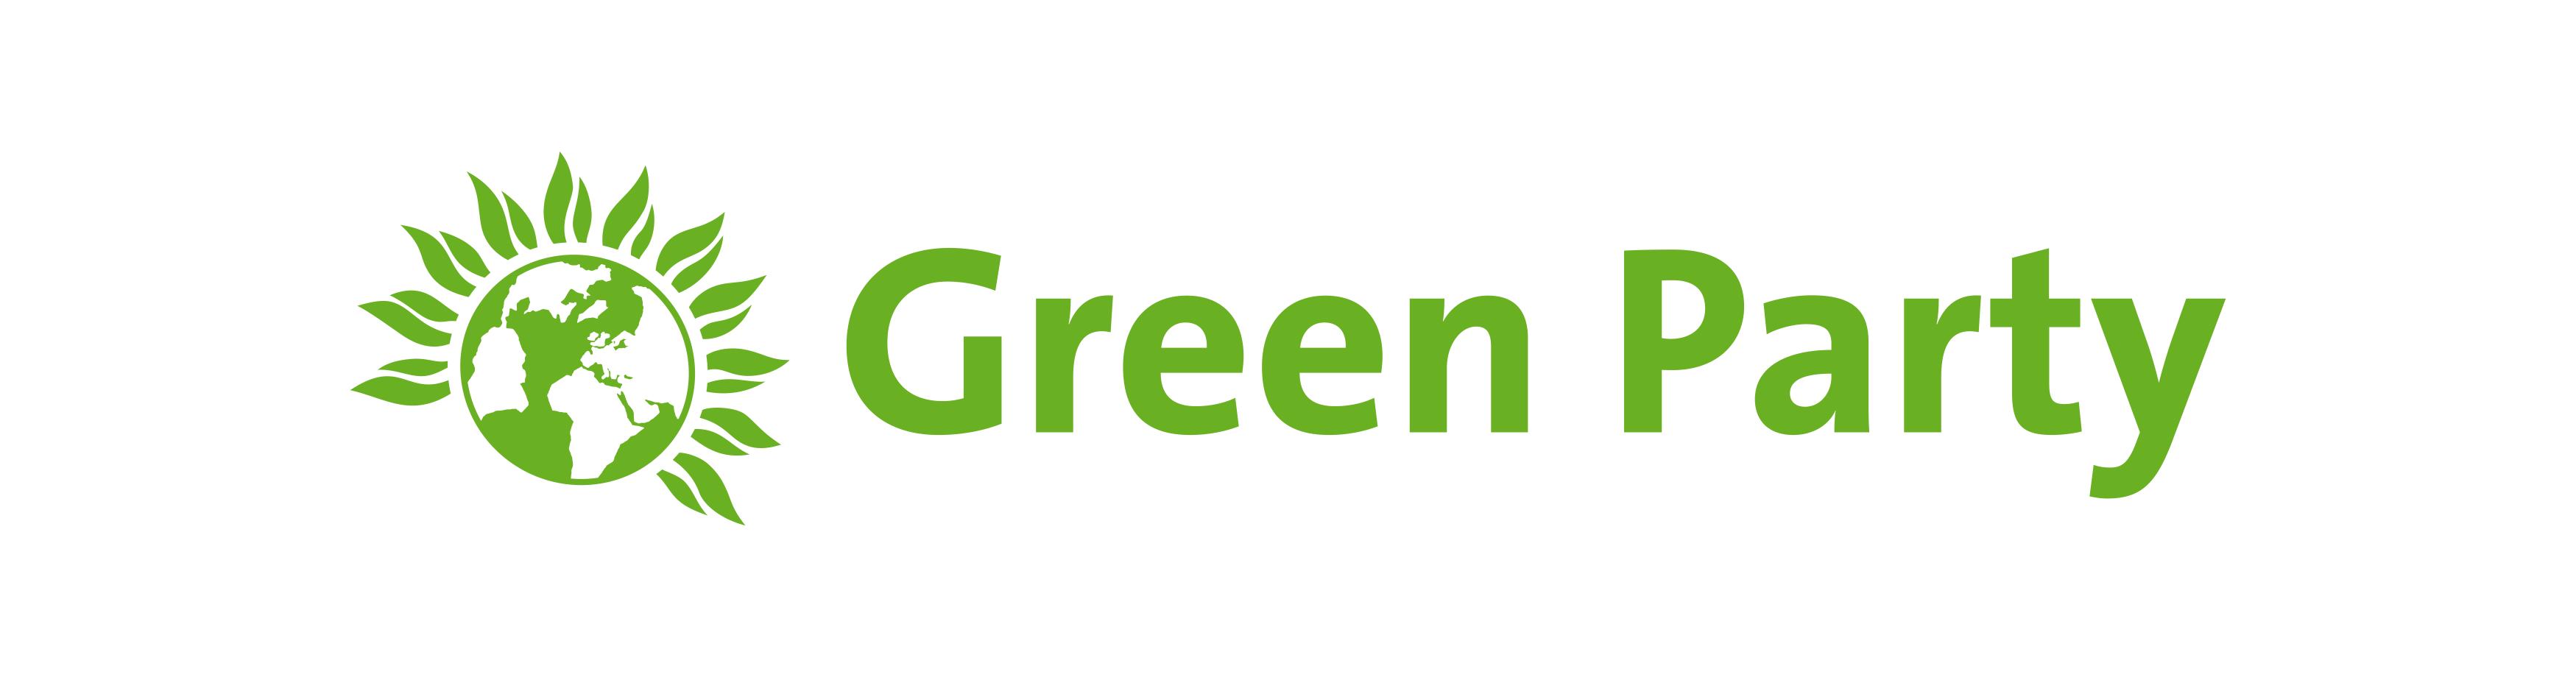 Green Party Visual Identity.